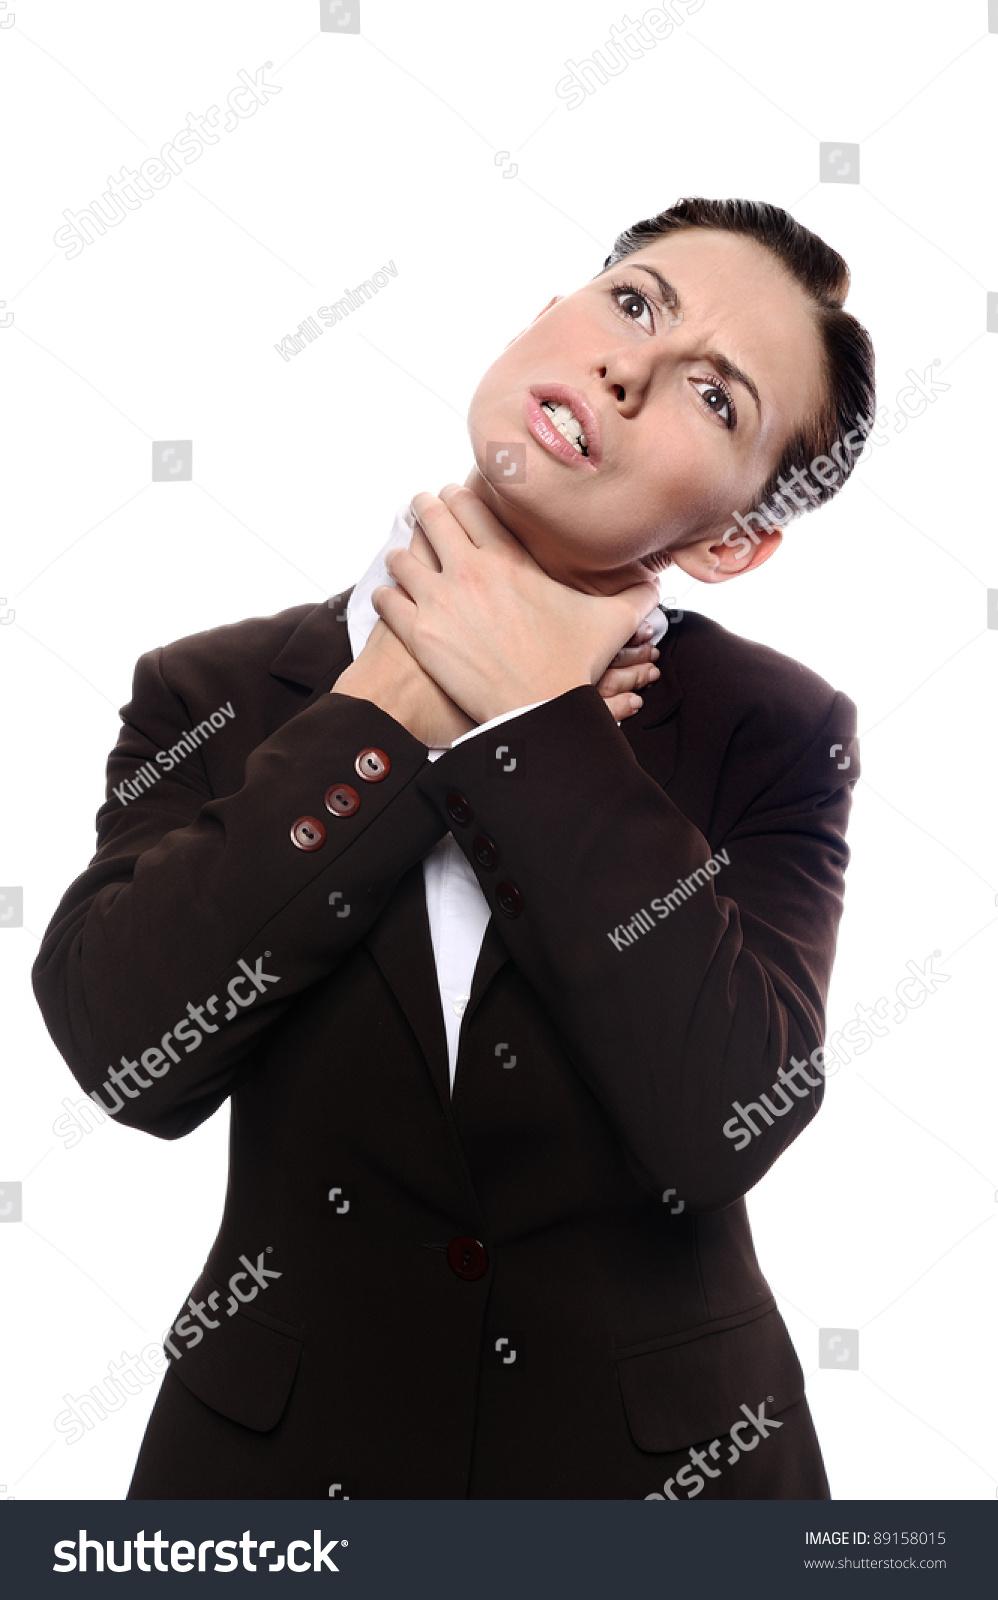 Older women porn pic galleri